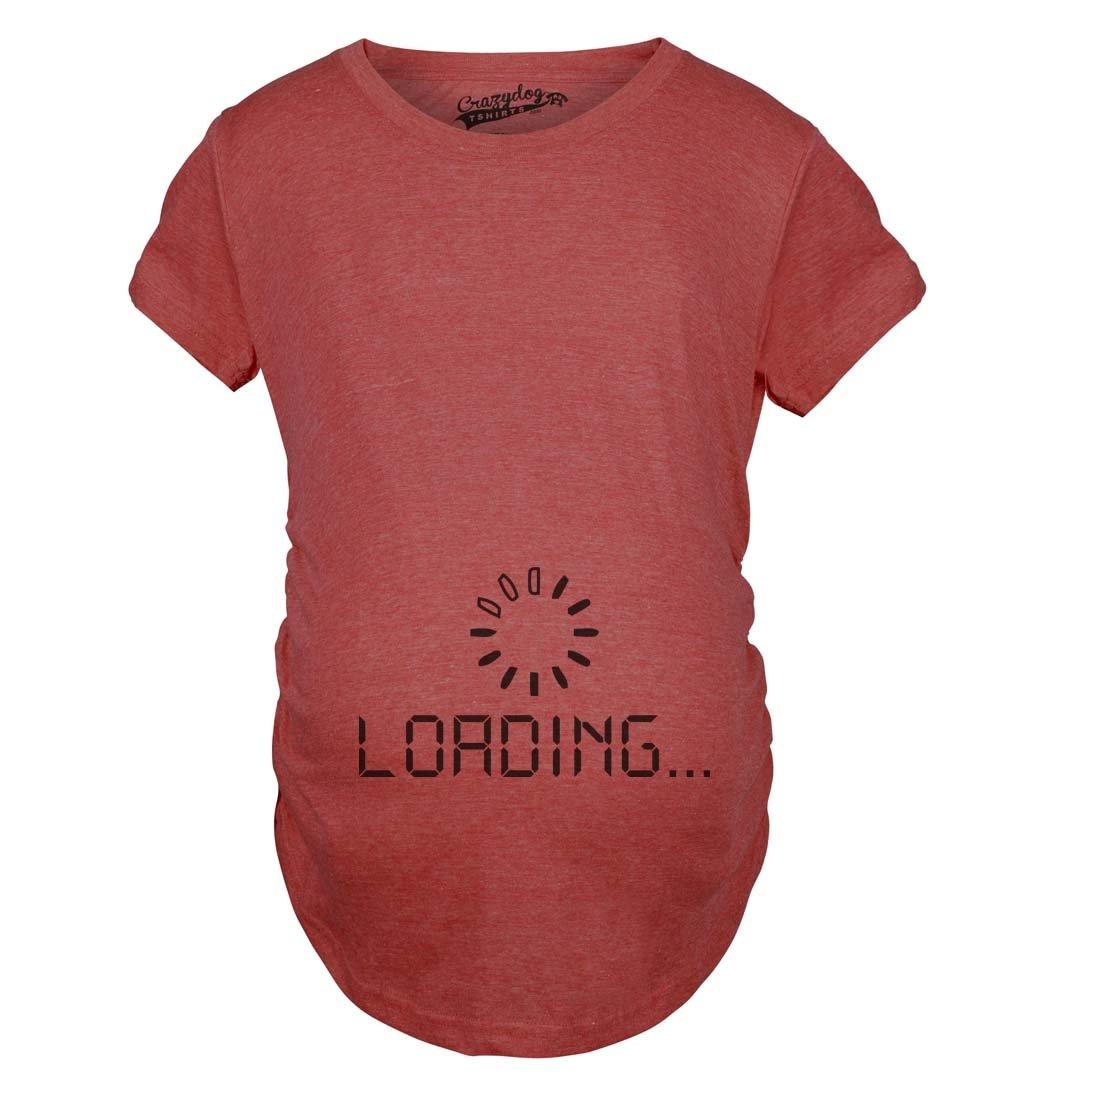 Maternity Baby Loading Shirt Humor Funny Pregnancy Shirts Cheap Tees Crazy Dog Tshirts